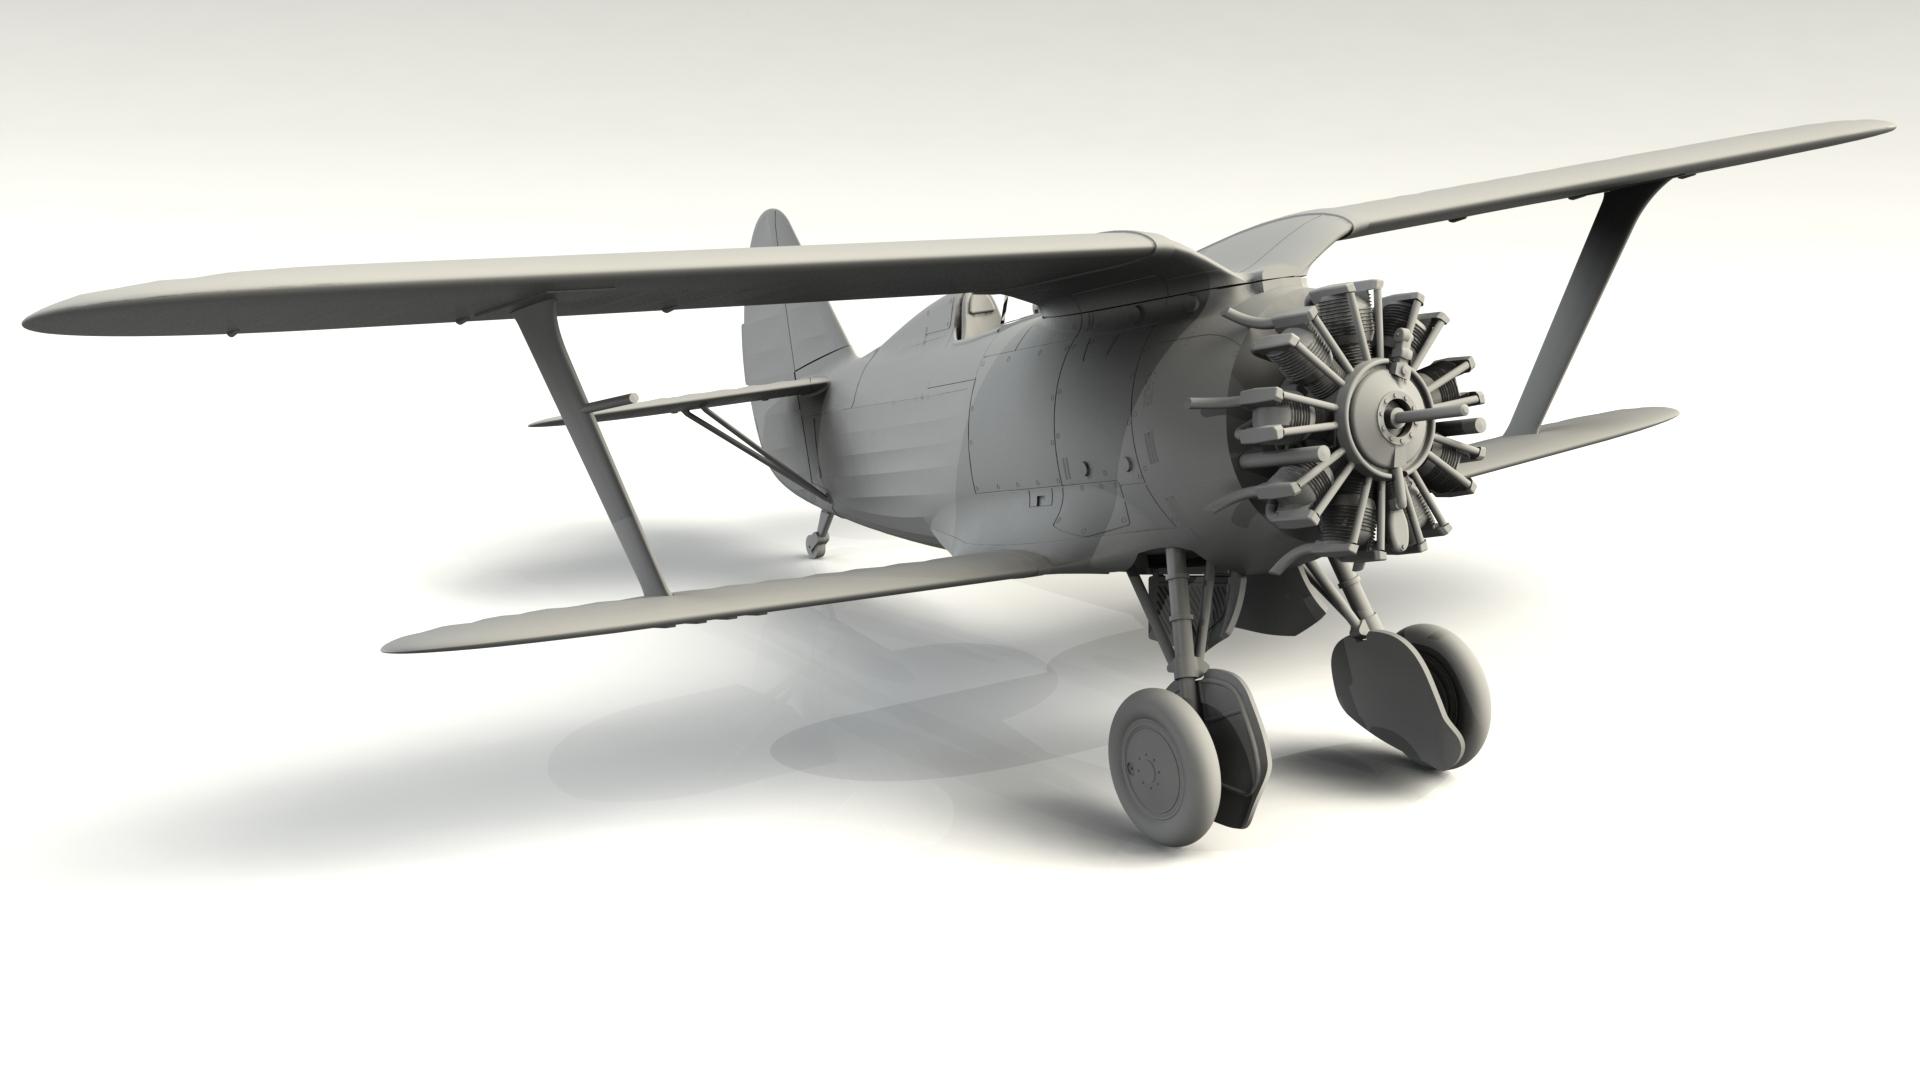 1/48 I-153, WWII China Guomindang AF Fighter 48099